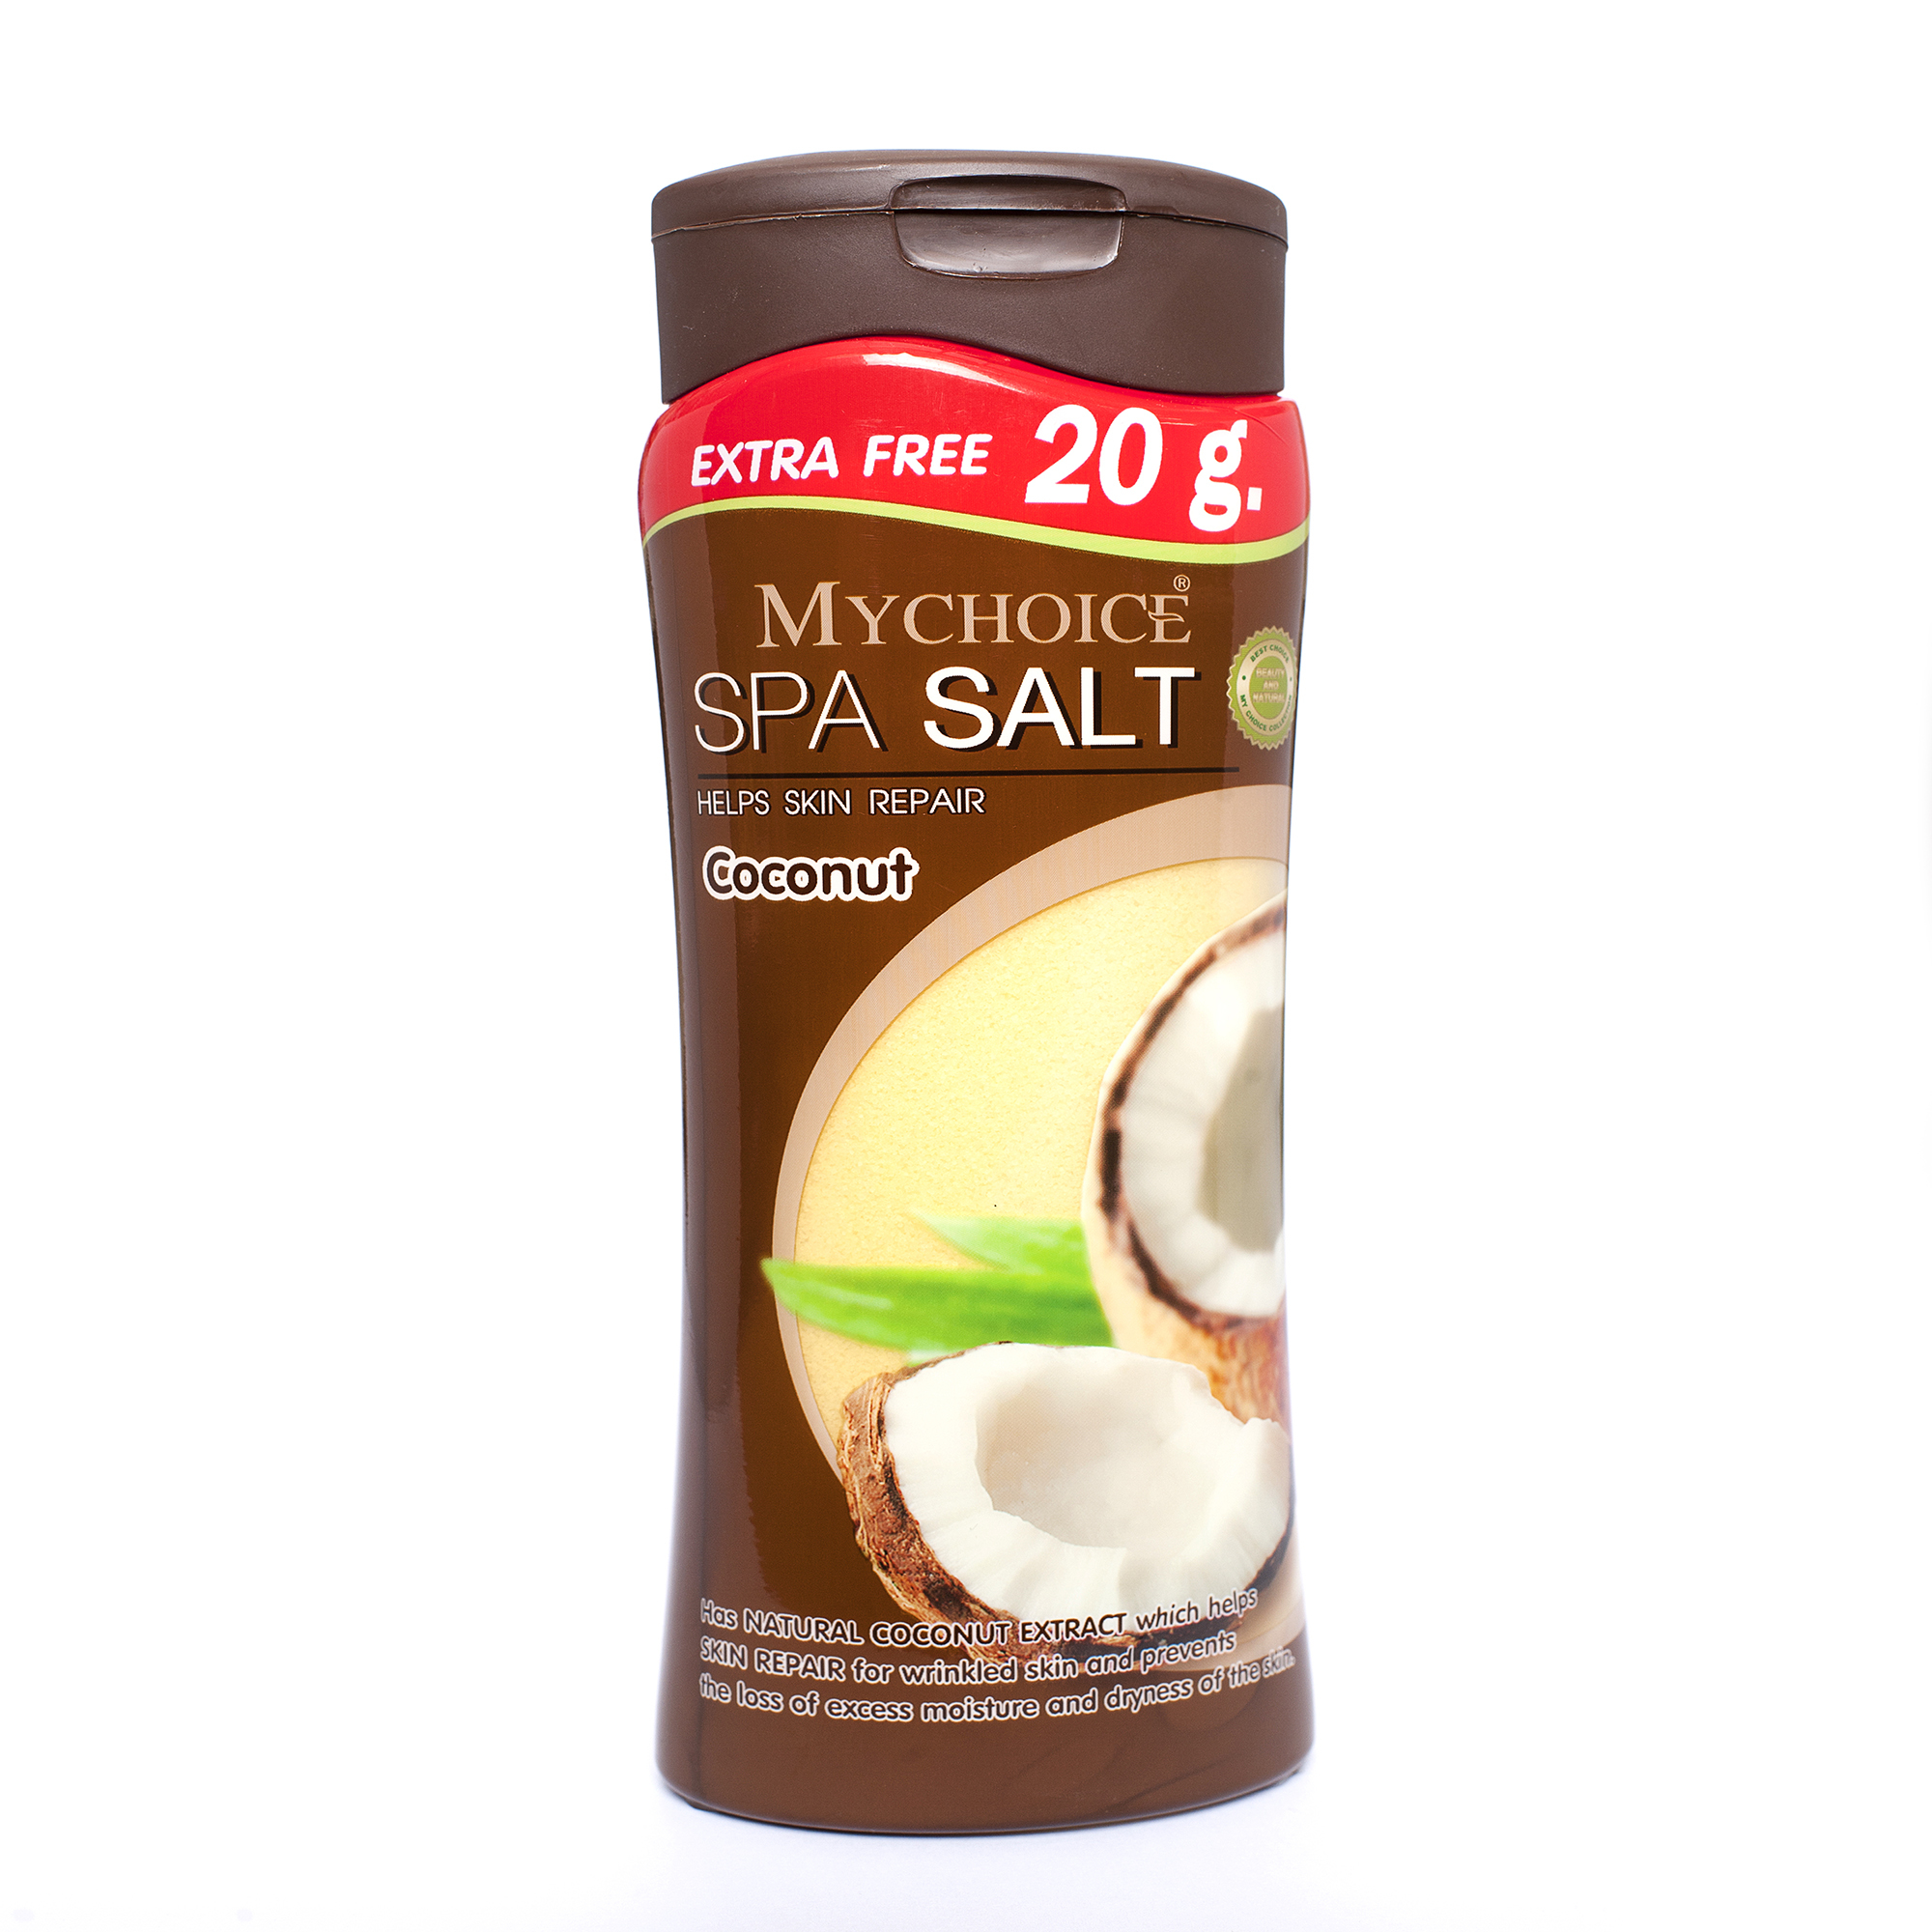 Mychoice Spa Salt Bottle  500g